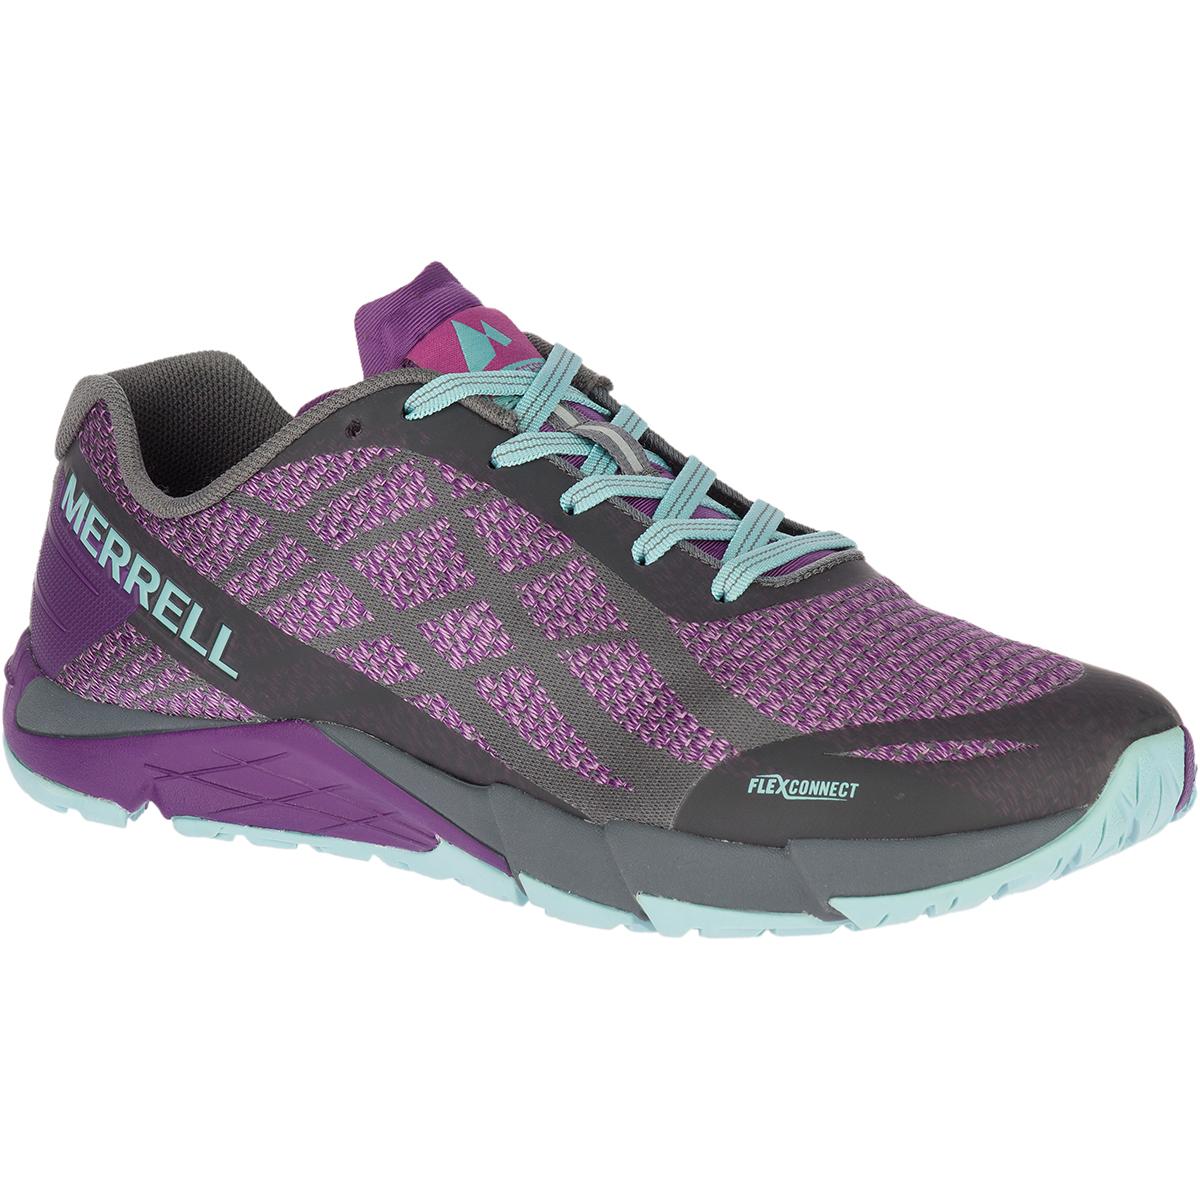 Merrell Women's Bare Access Flex Shield Trail Running Shoes - Purple, 10